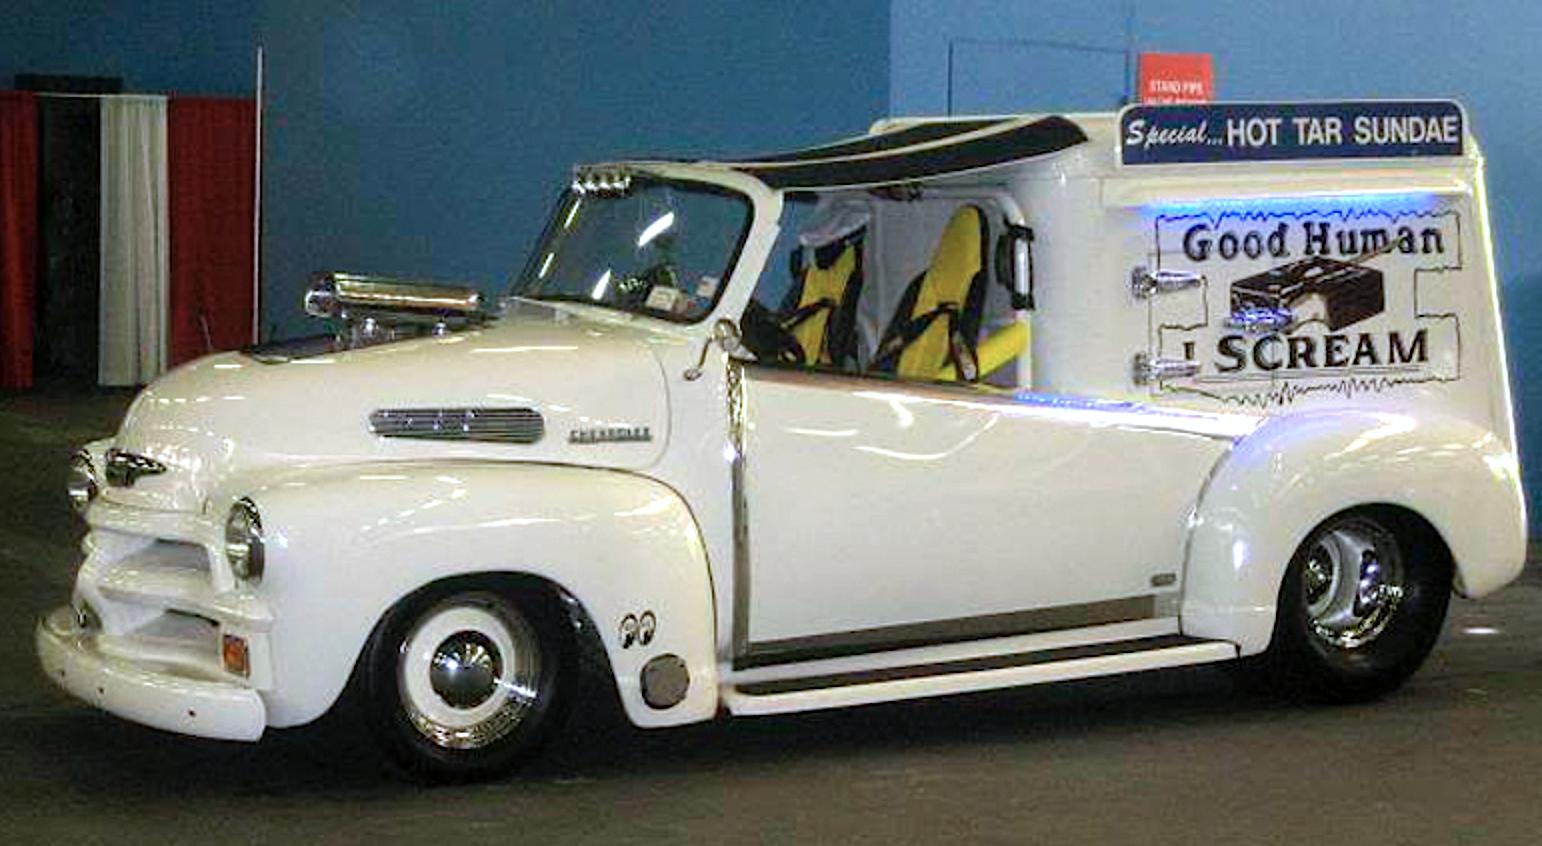 1951 Chevy 3100 Hot Rod Ice Cream Truck Vintage Ice Cream Ice Cream Truck Good Humor Ice Cream